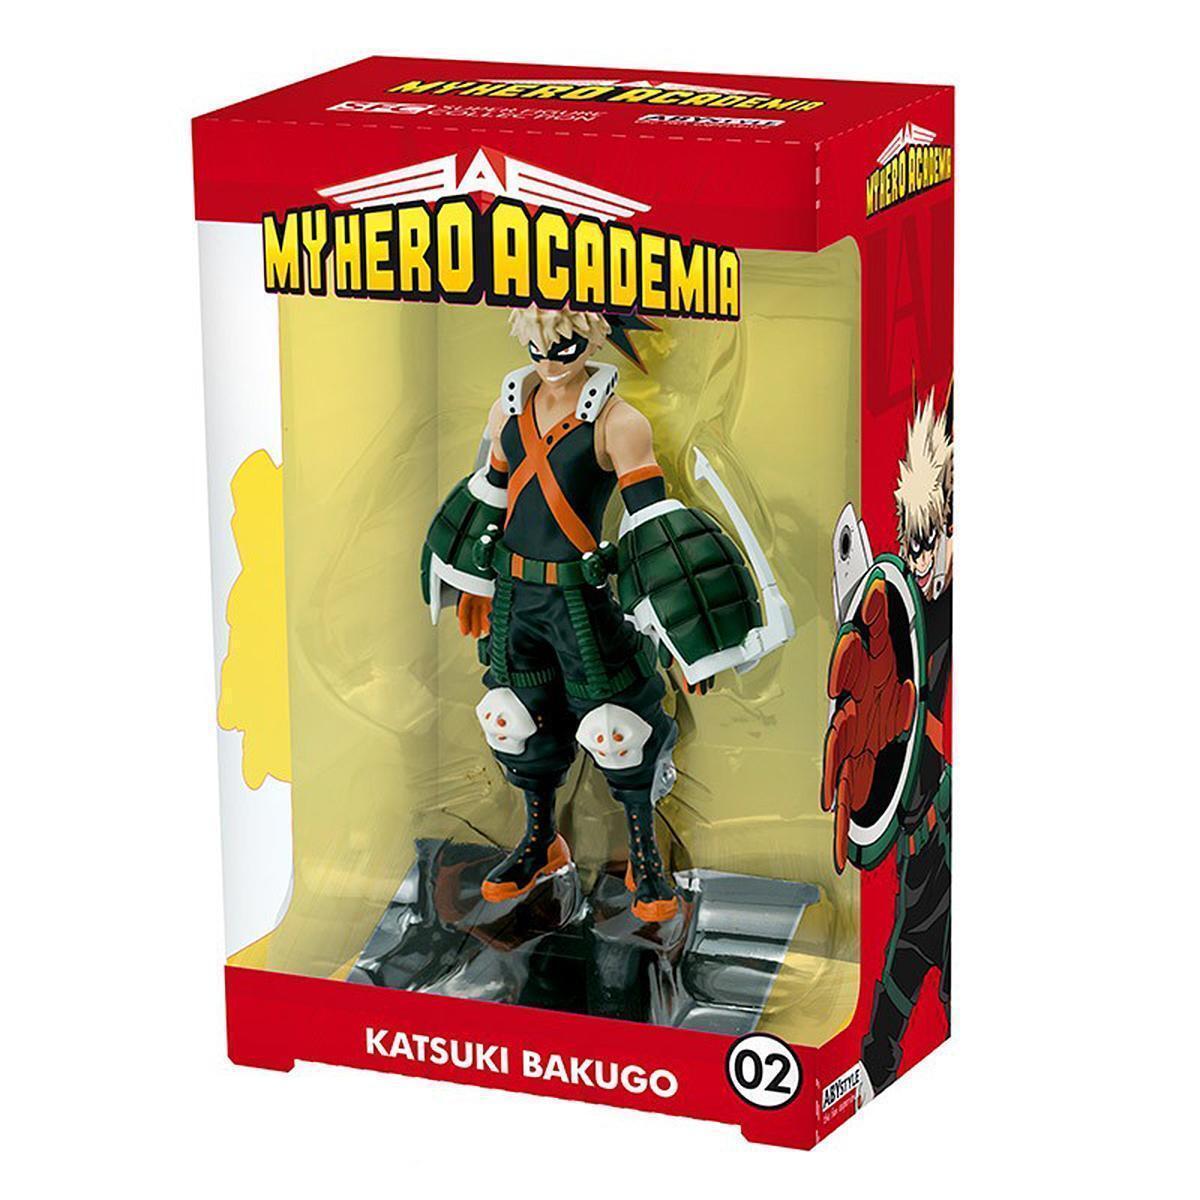 MY HERO HERO HERO ACADEMIA SUPER FIGURE COLLECTION KATSUKI BAKUGO 3f255c